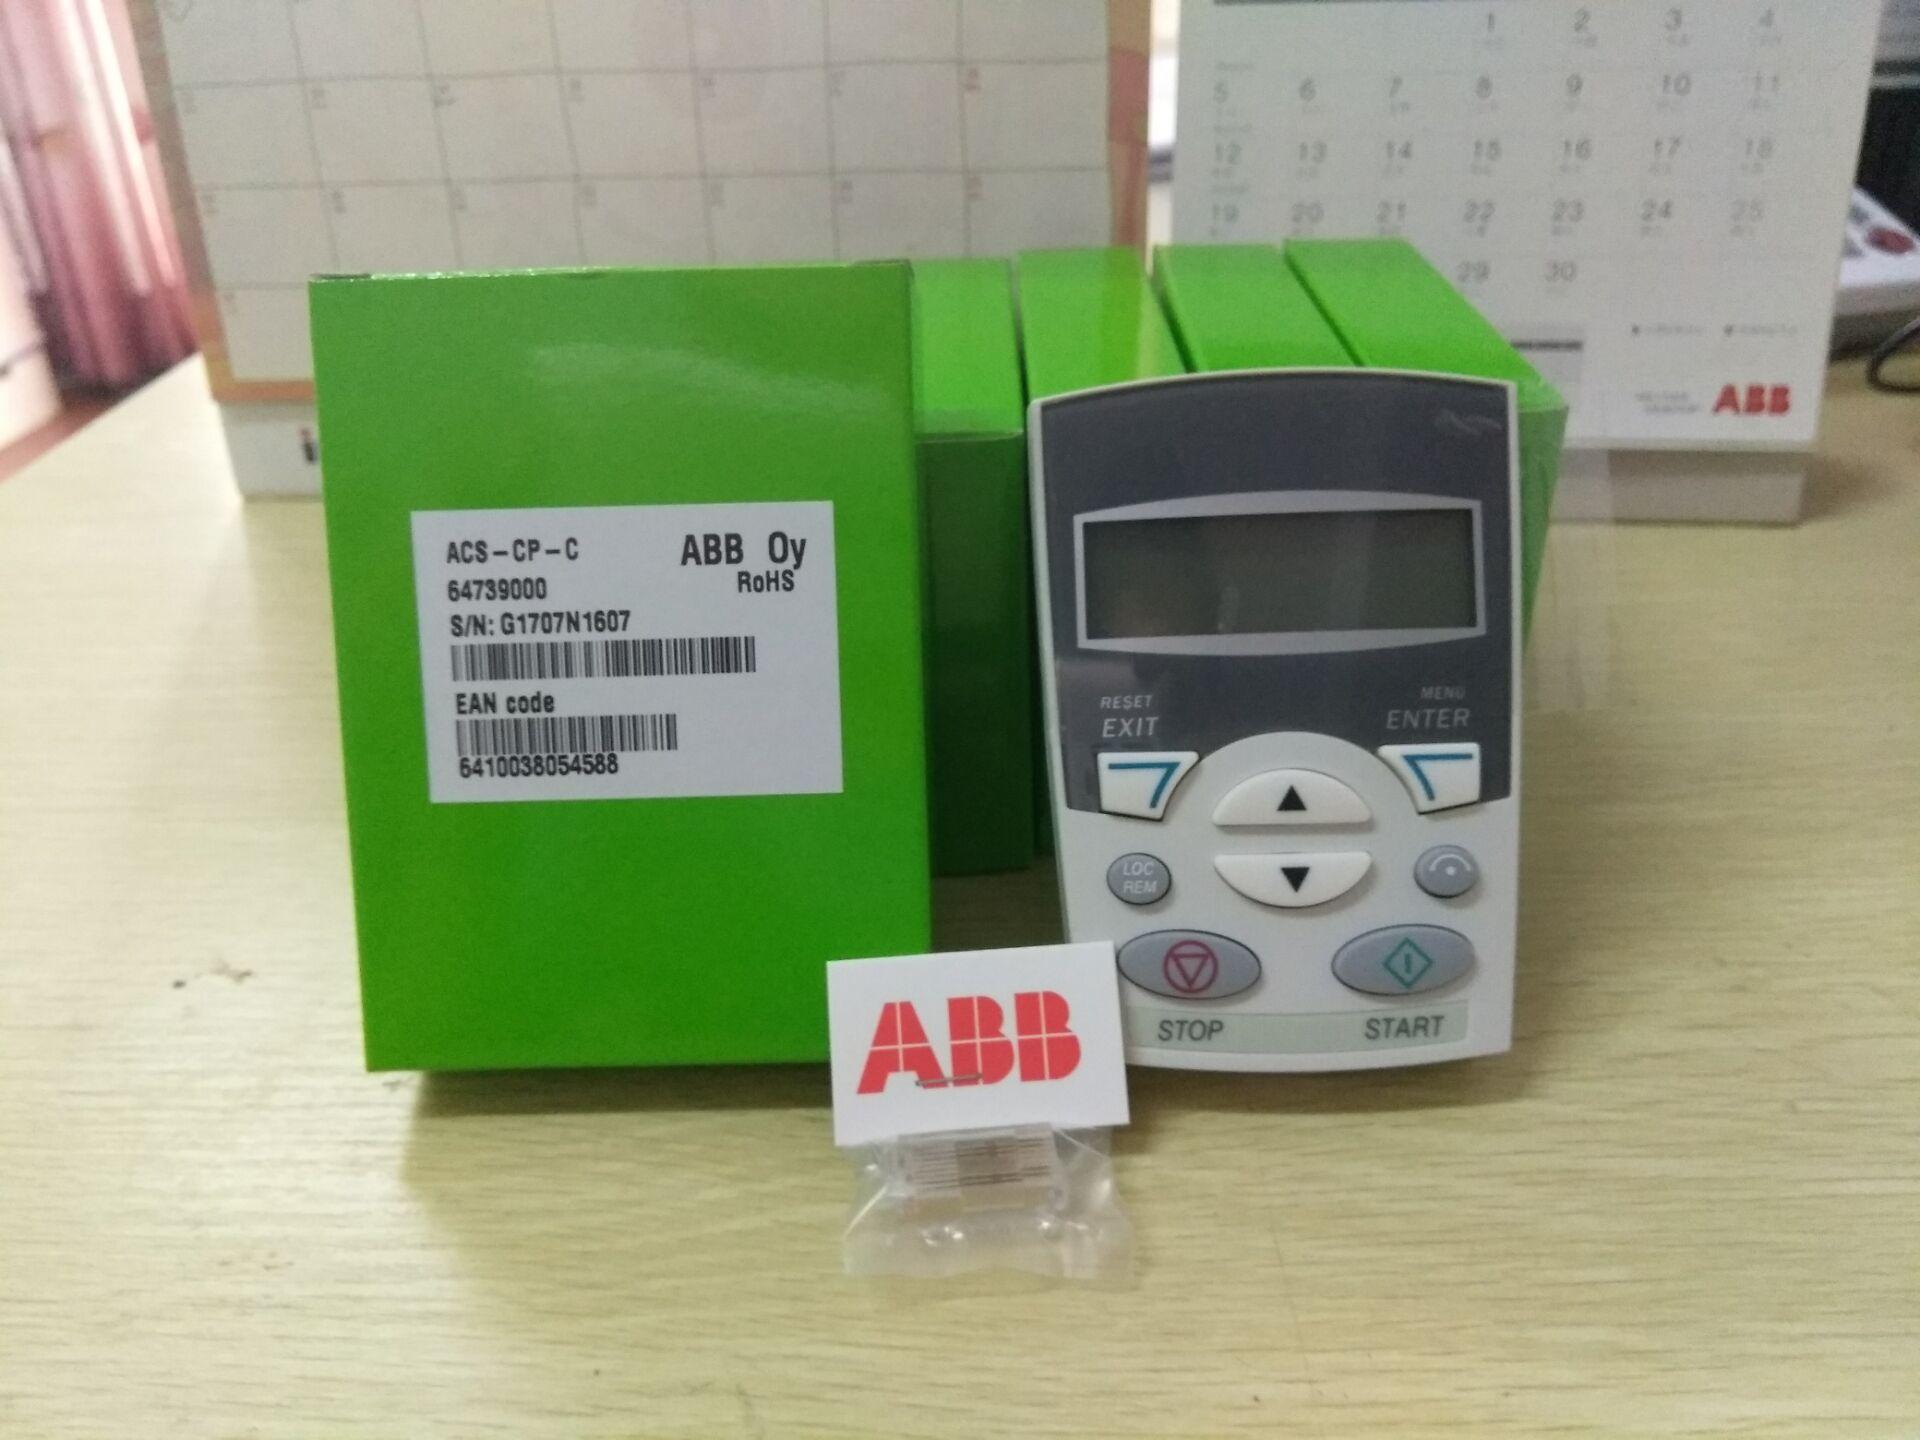 ACS-CP-C/ английский контроль блюдо /abb преобразование частот устройство /ACS510/ABB преобразование частот устройство панель /